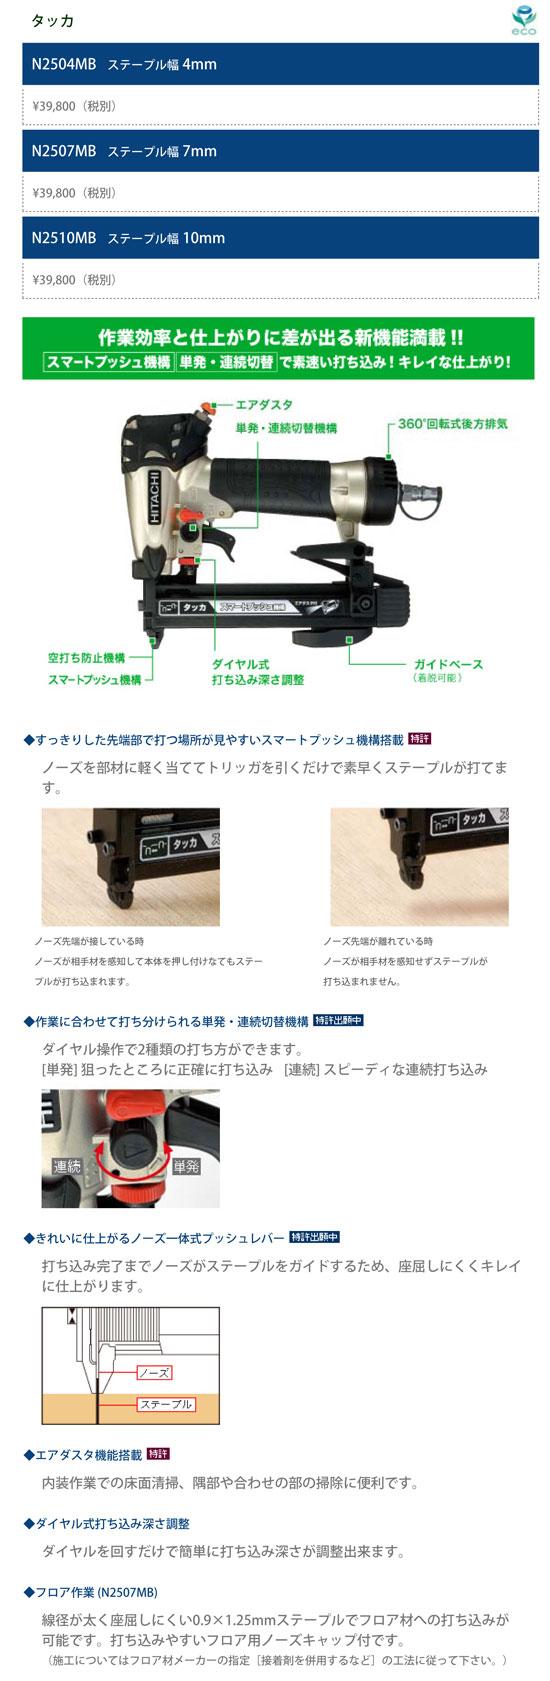 N2504 商品詳細